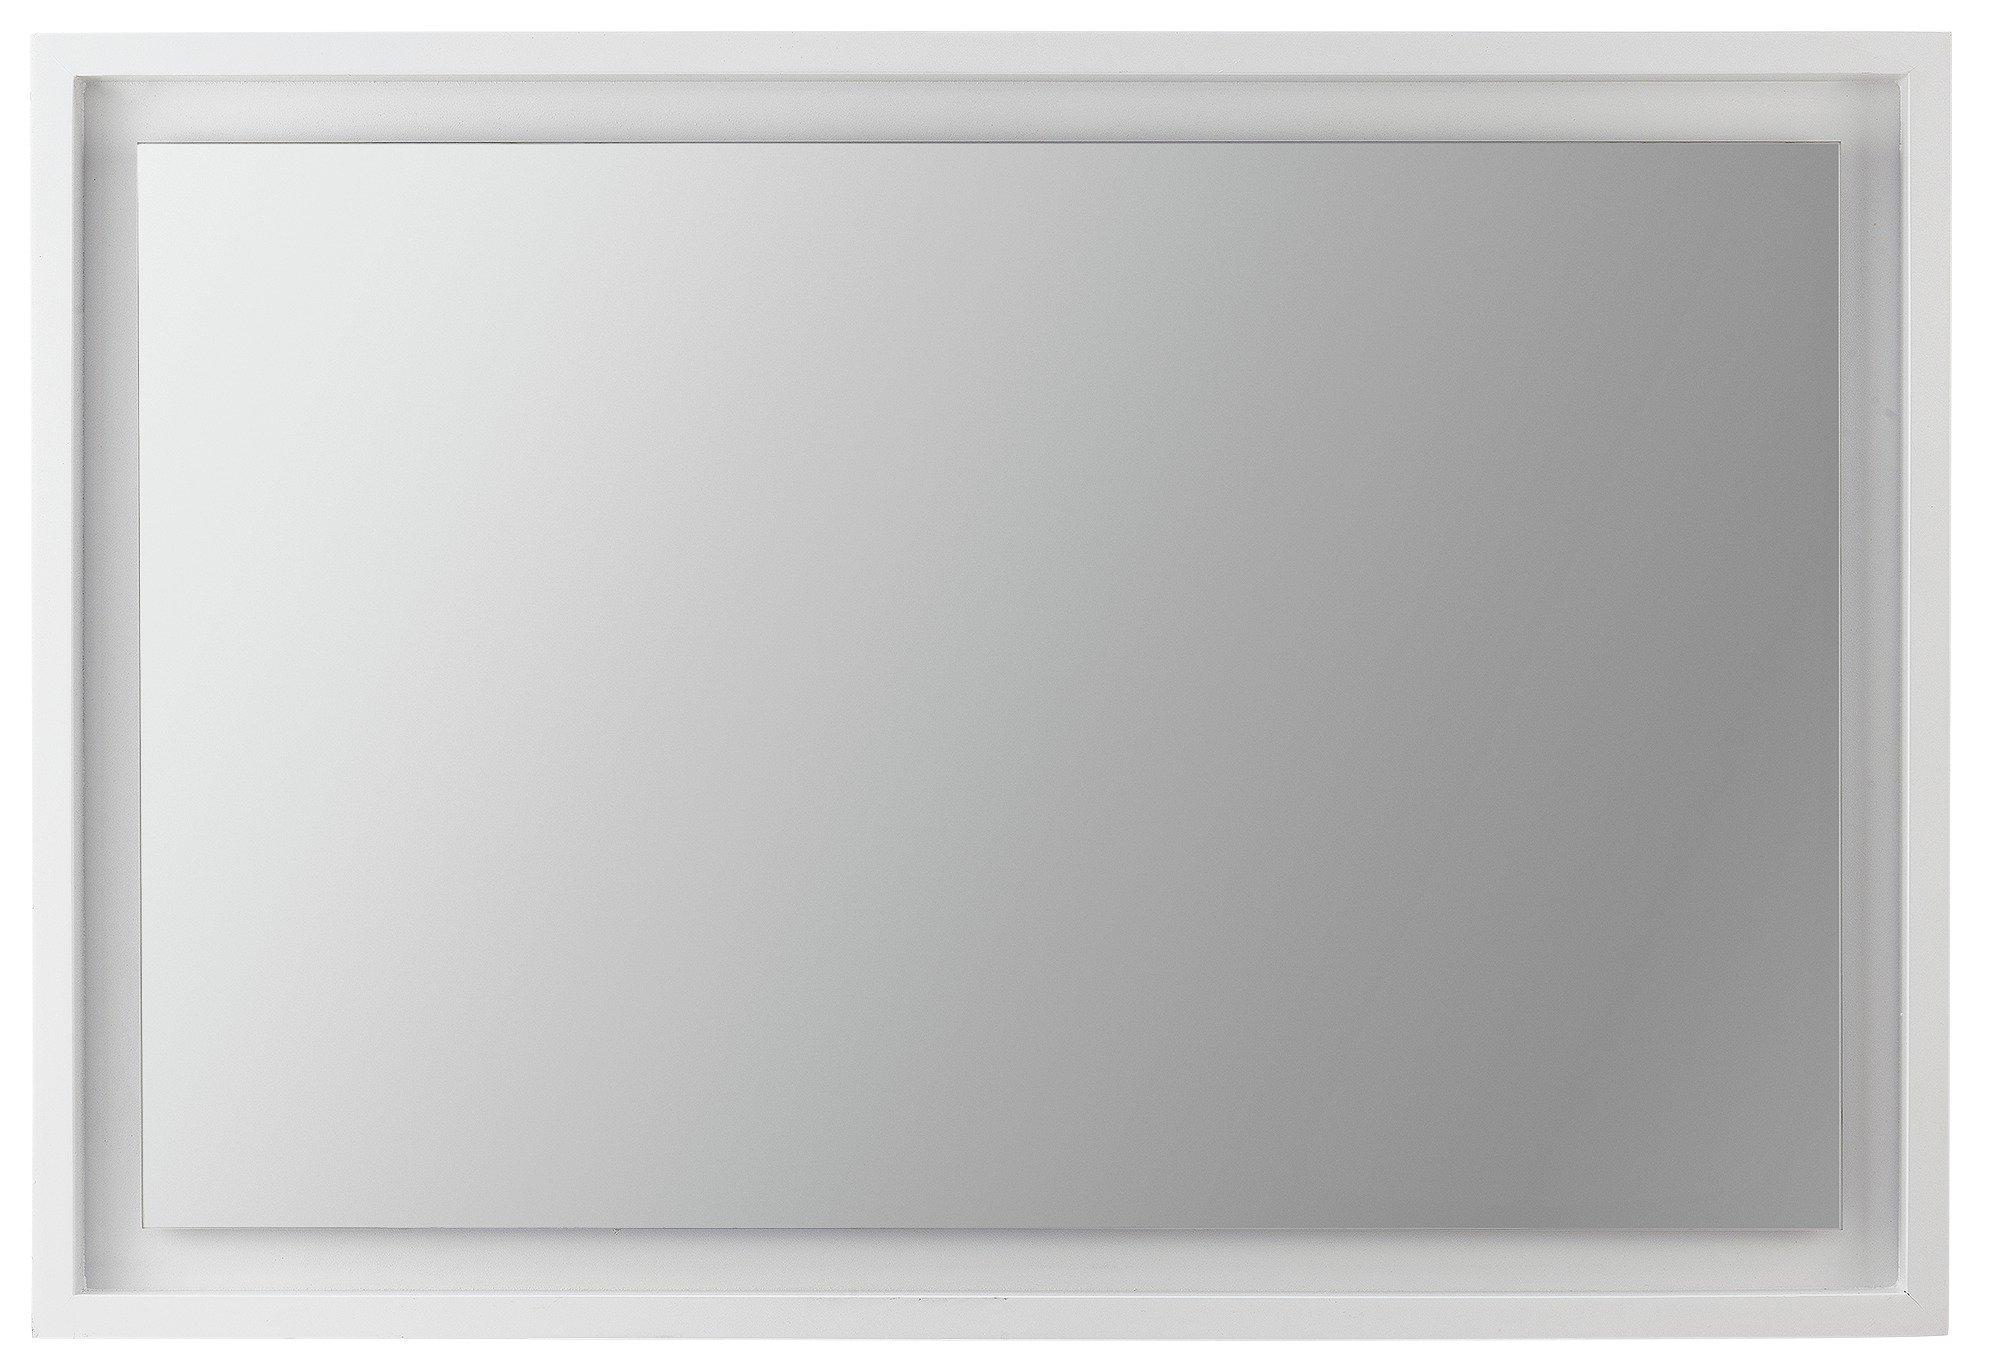 Argos Home Siena Rectangular Floating Wooden Mirror - White